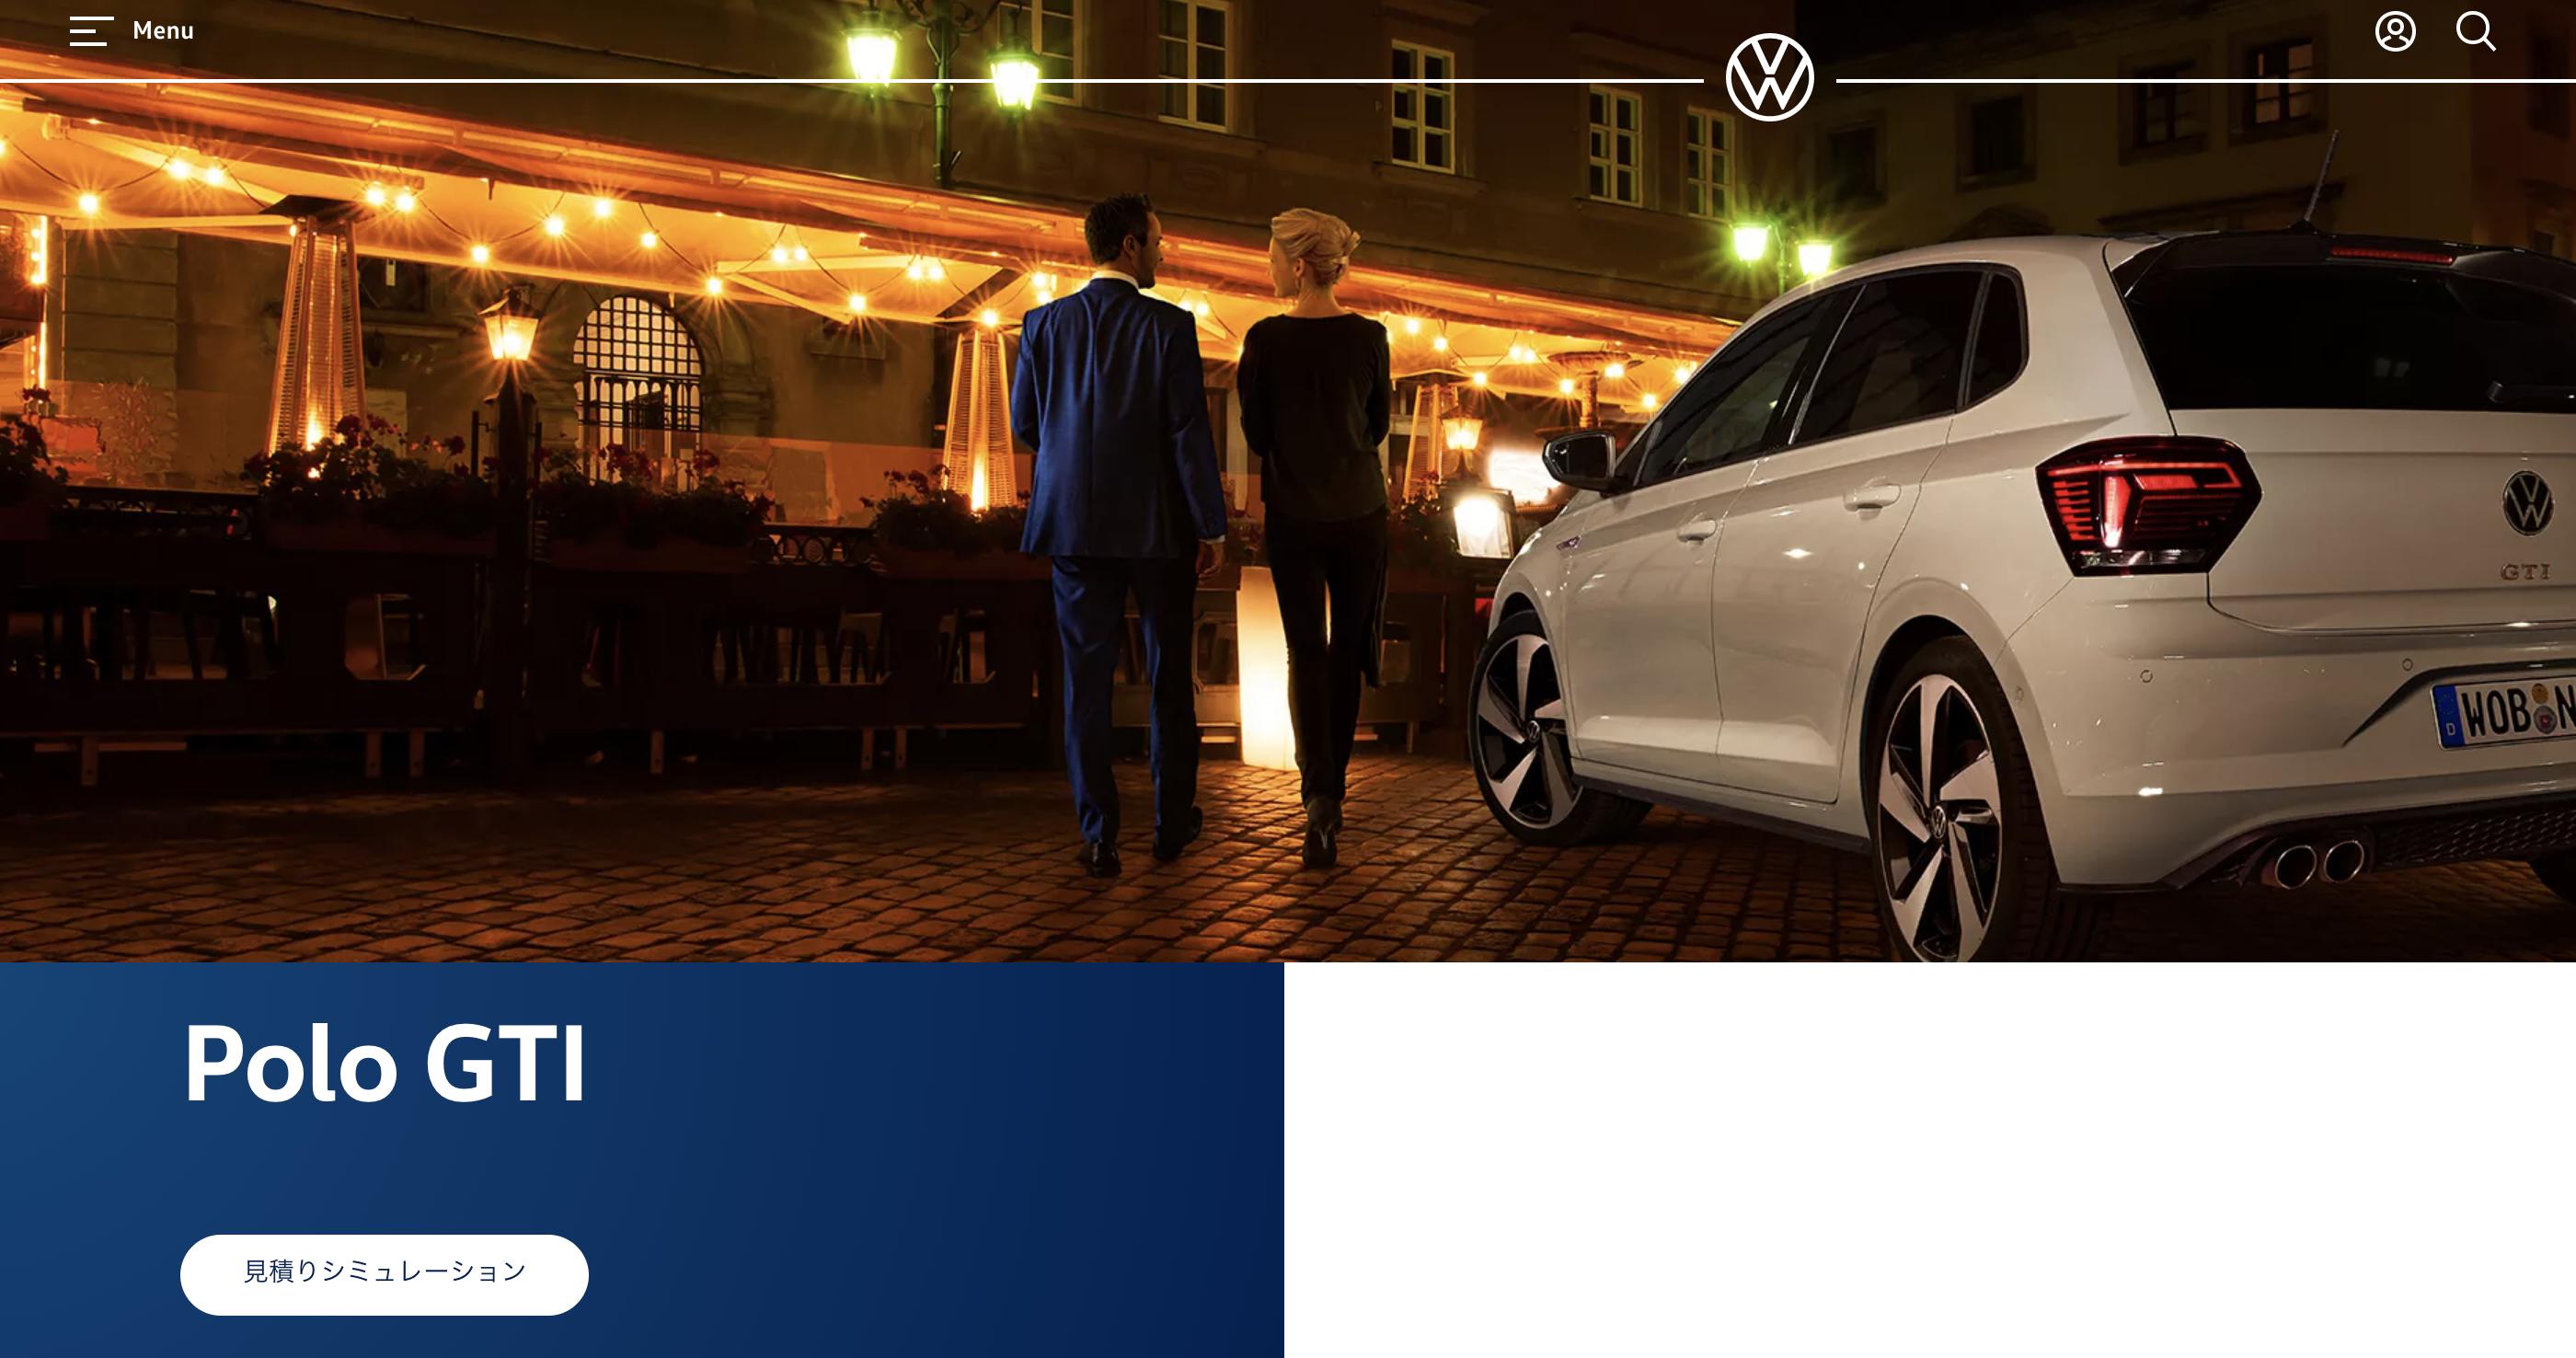 【出典】VW - Polo GTI